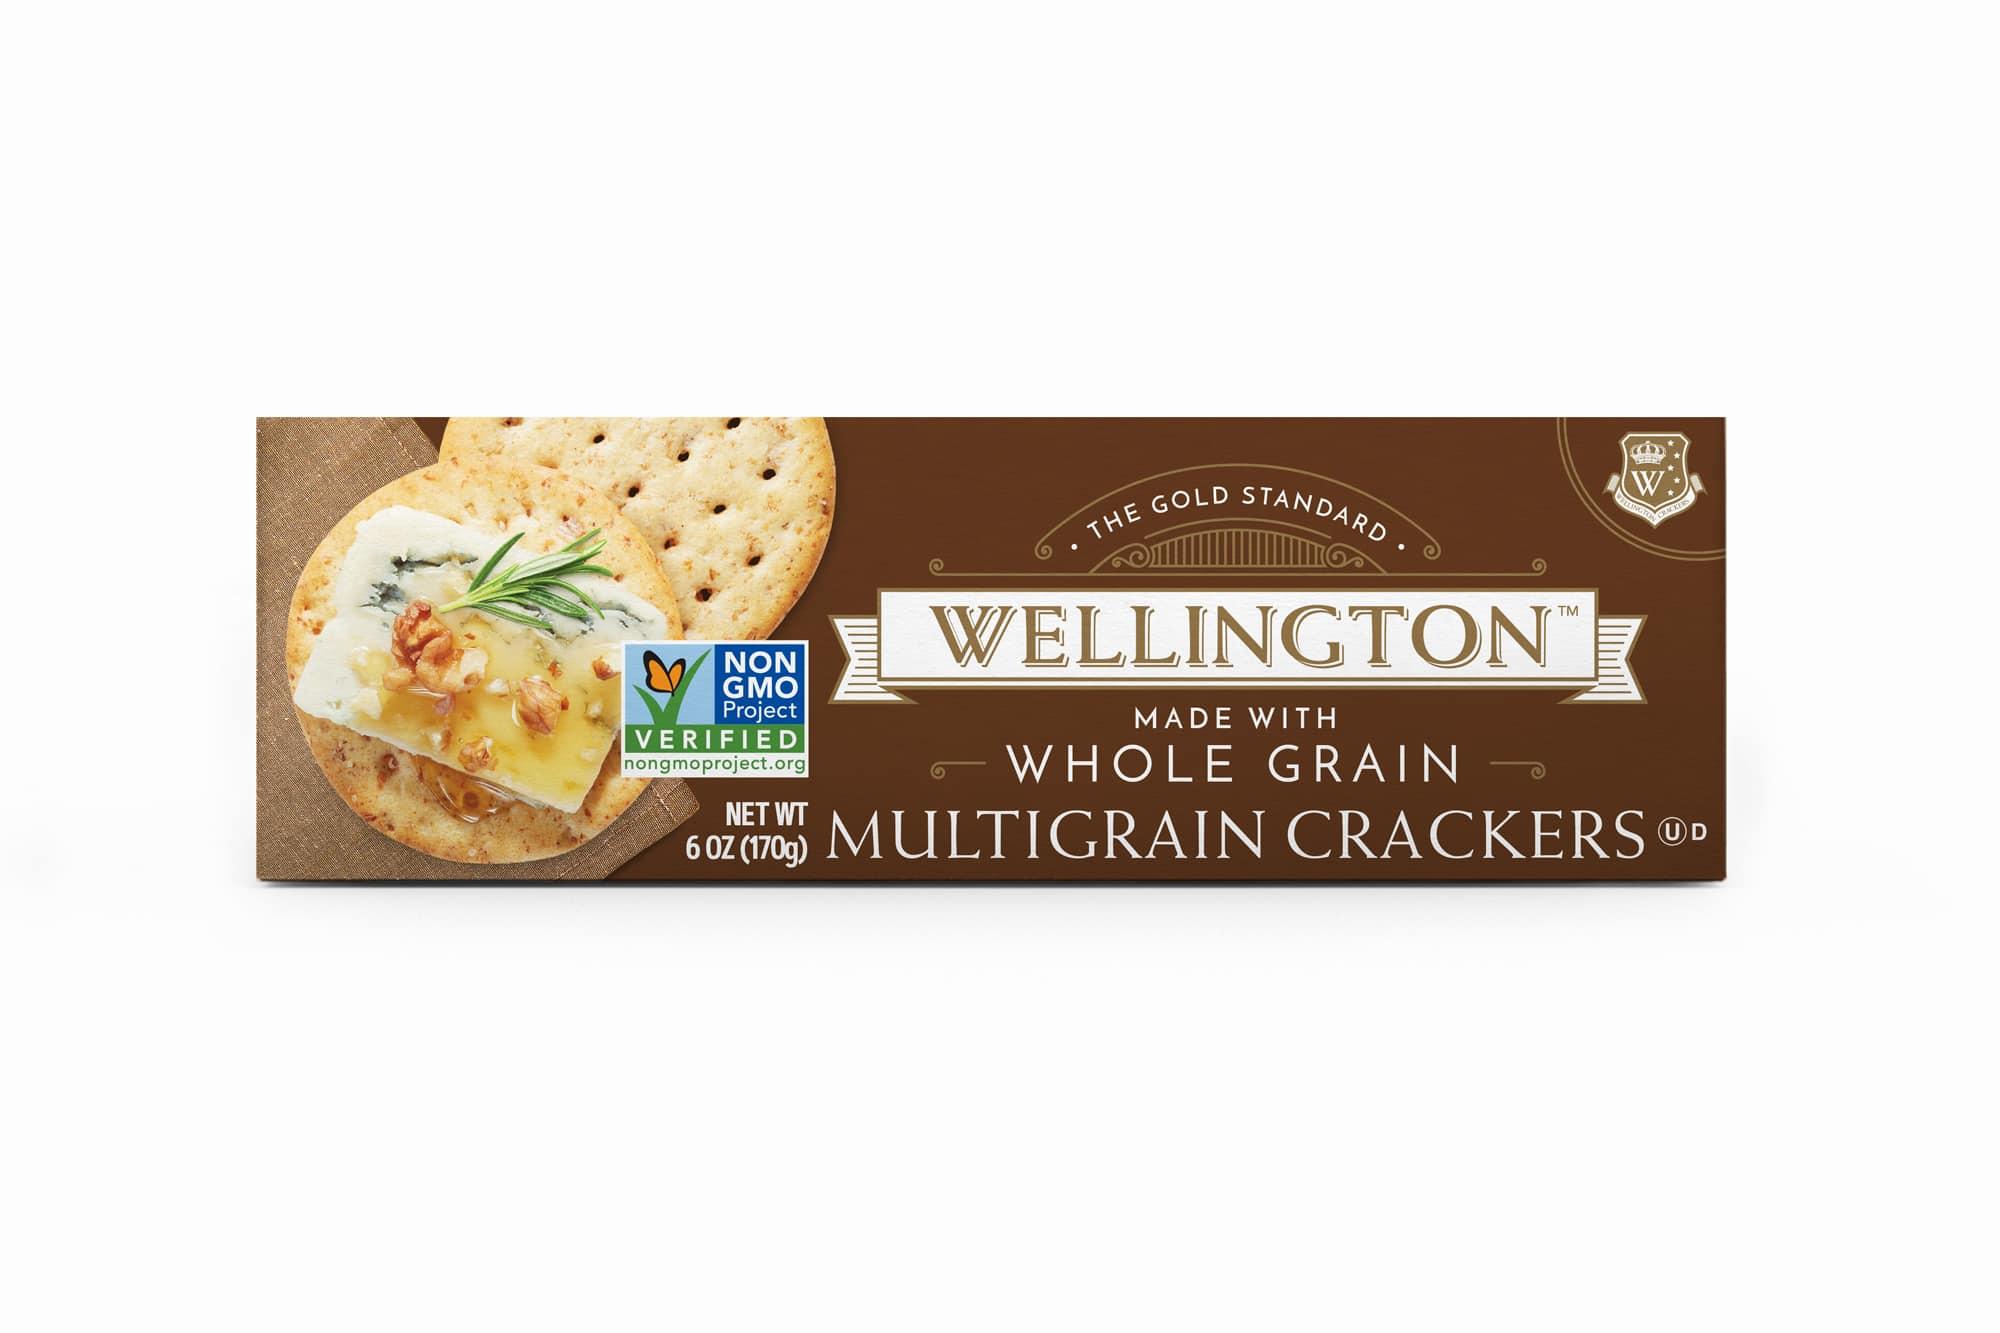 Whole Grain Multigrain Crackers